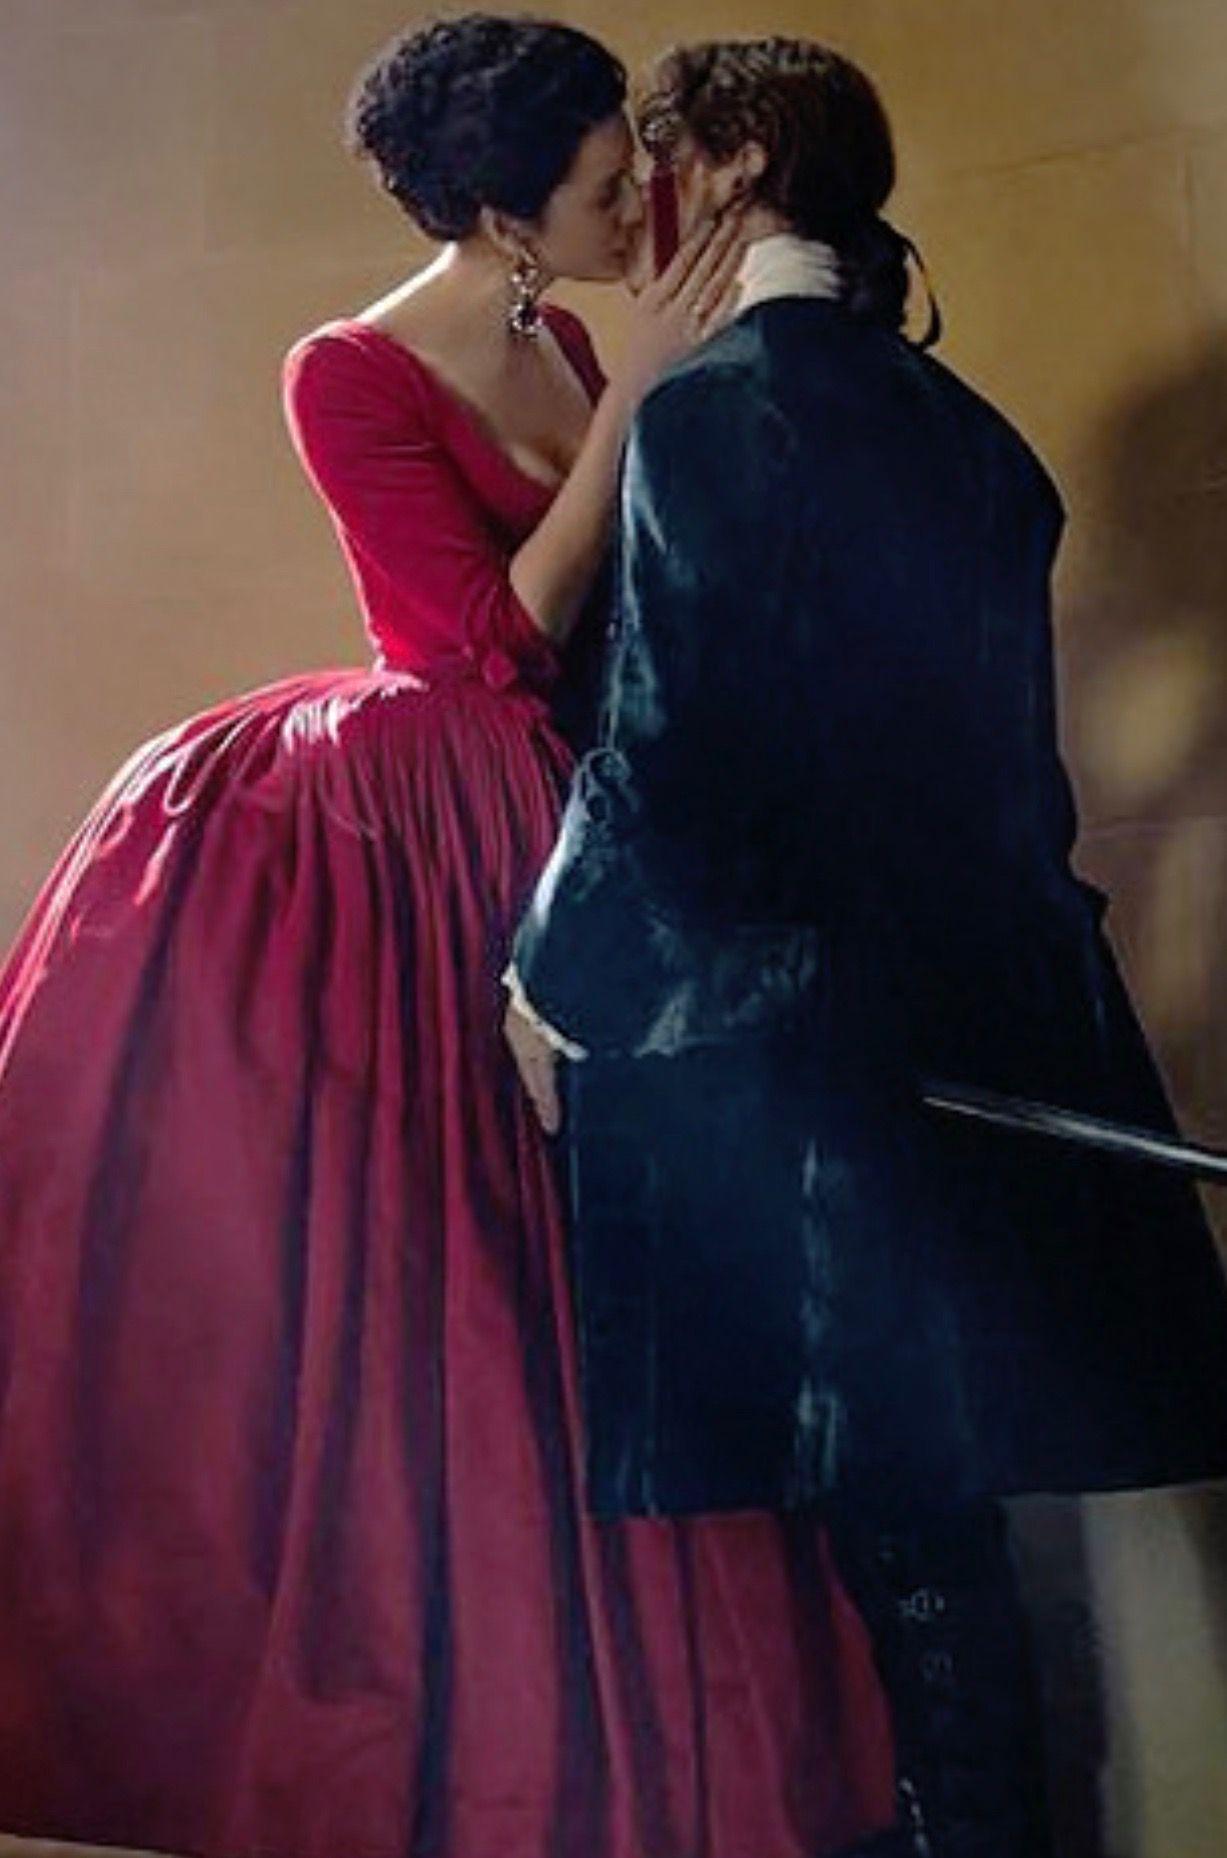 Season 2 Episode 2 Outlander Reddress Outlander Scotland Outlander Claire Outlander Costumes Outlander